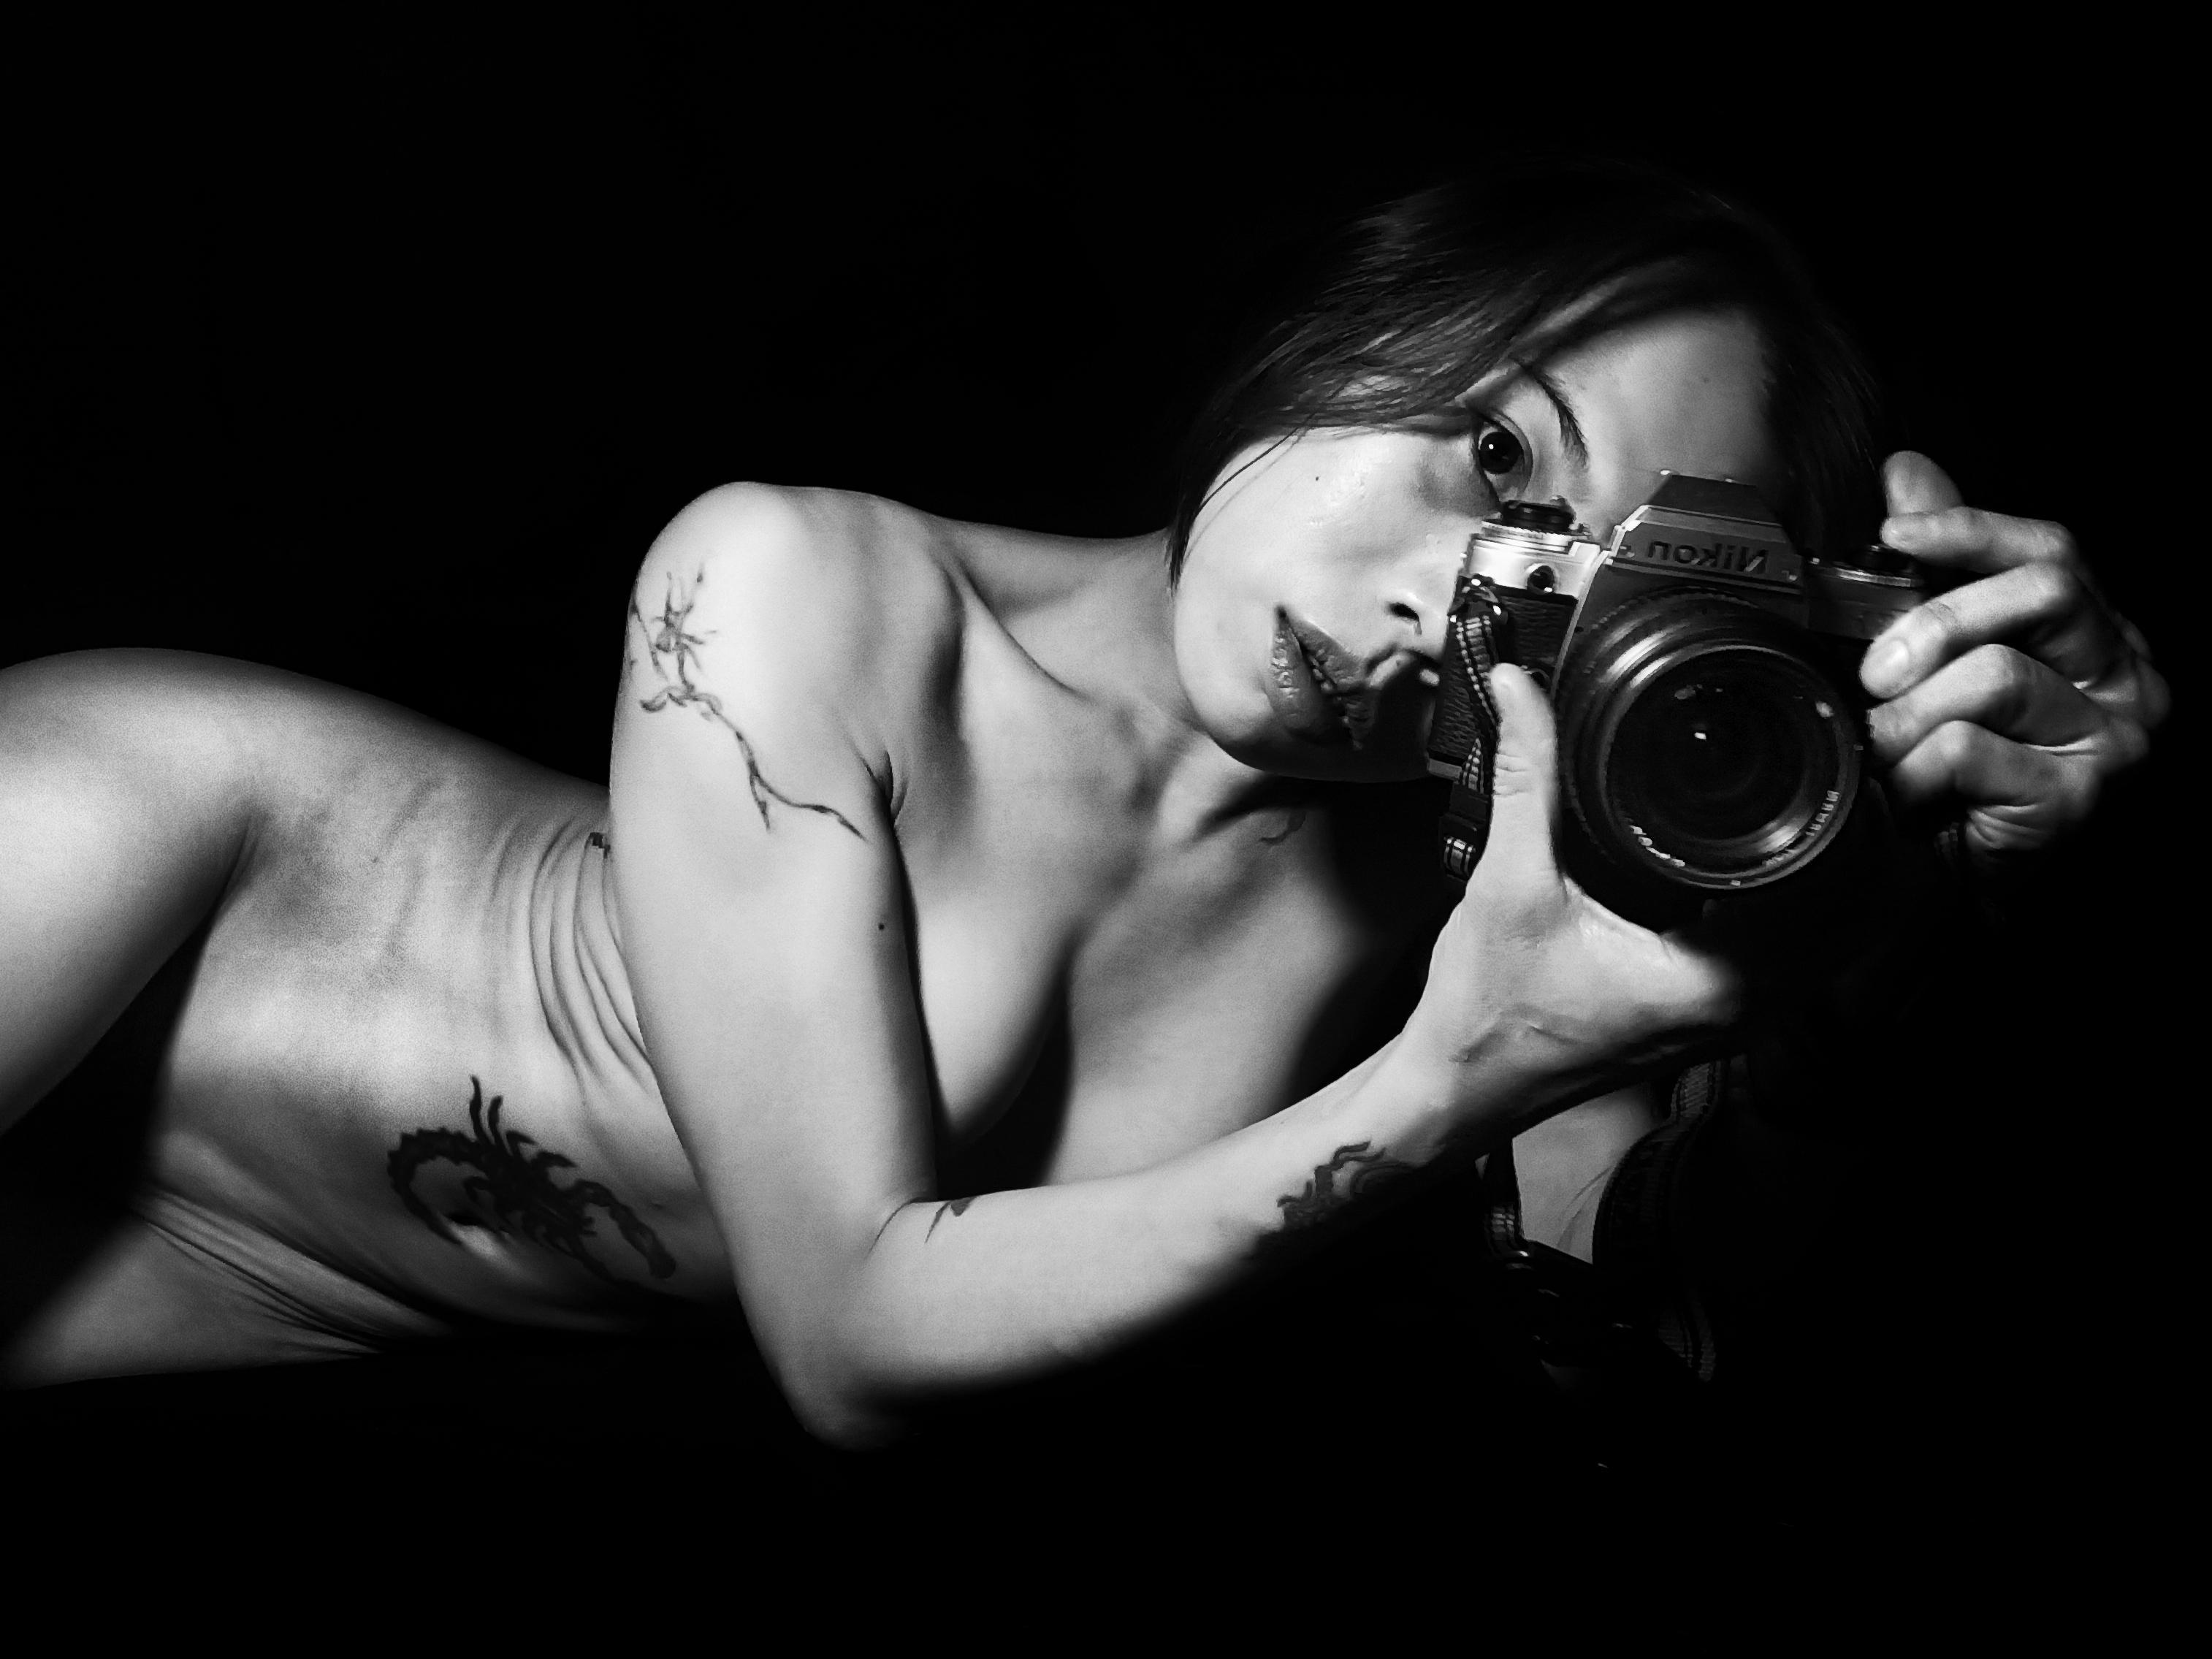 Suelynee Ho Taiwan artist black and white nude art